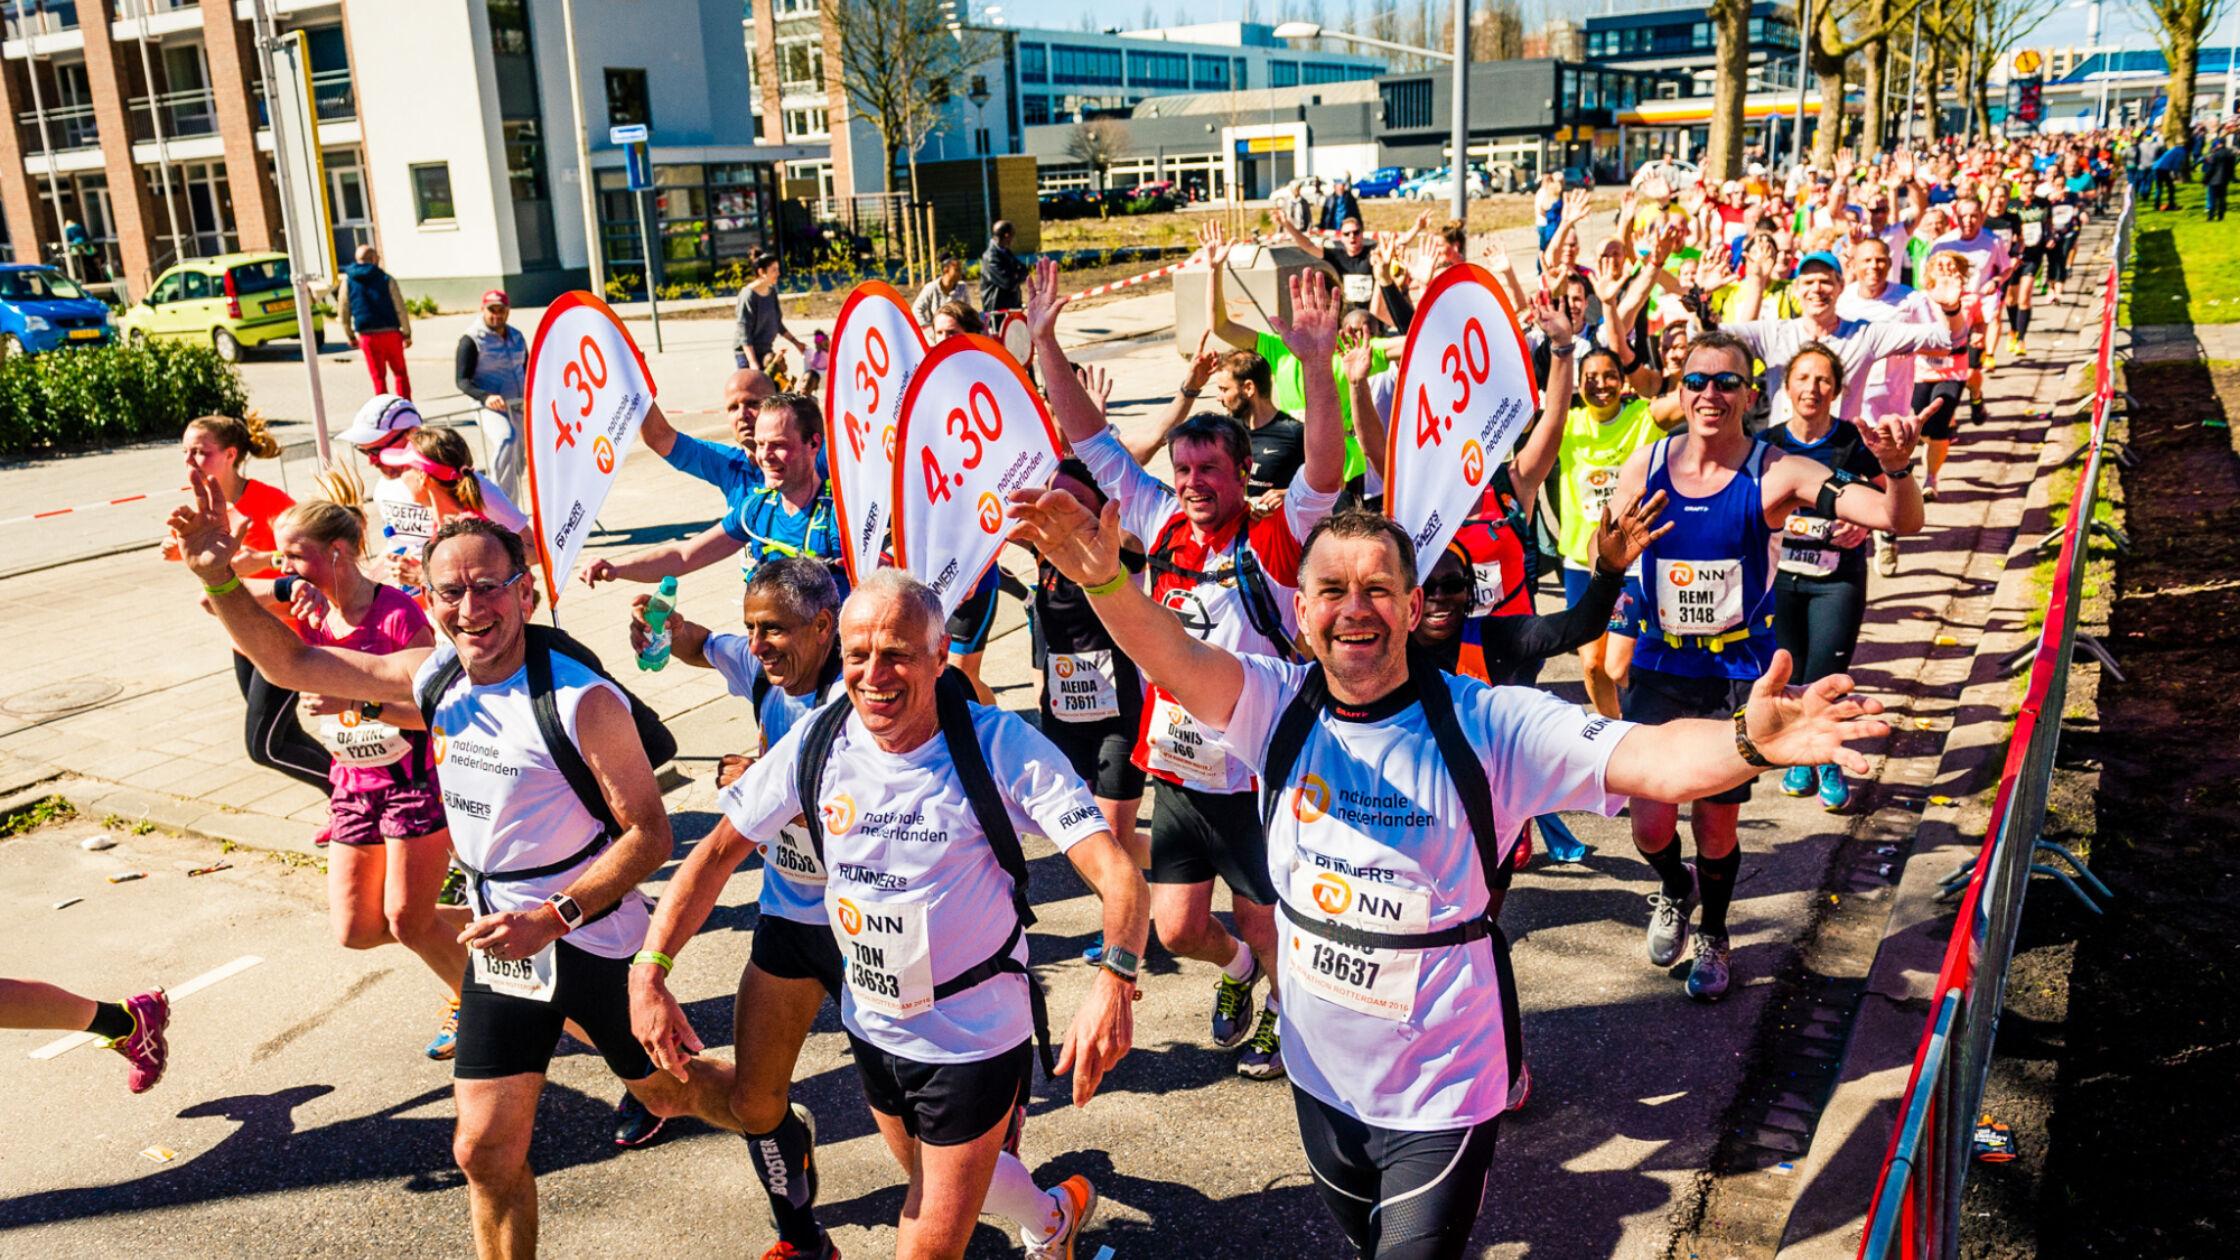 Kies jouw tempogroep bij de NN Marathon Rotterdam